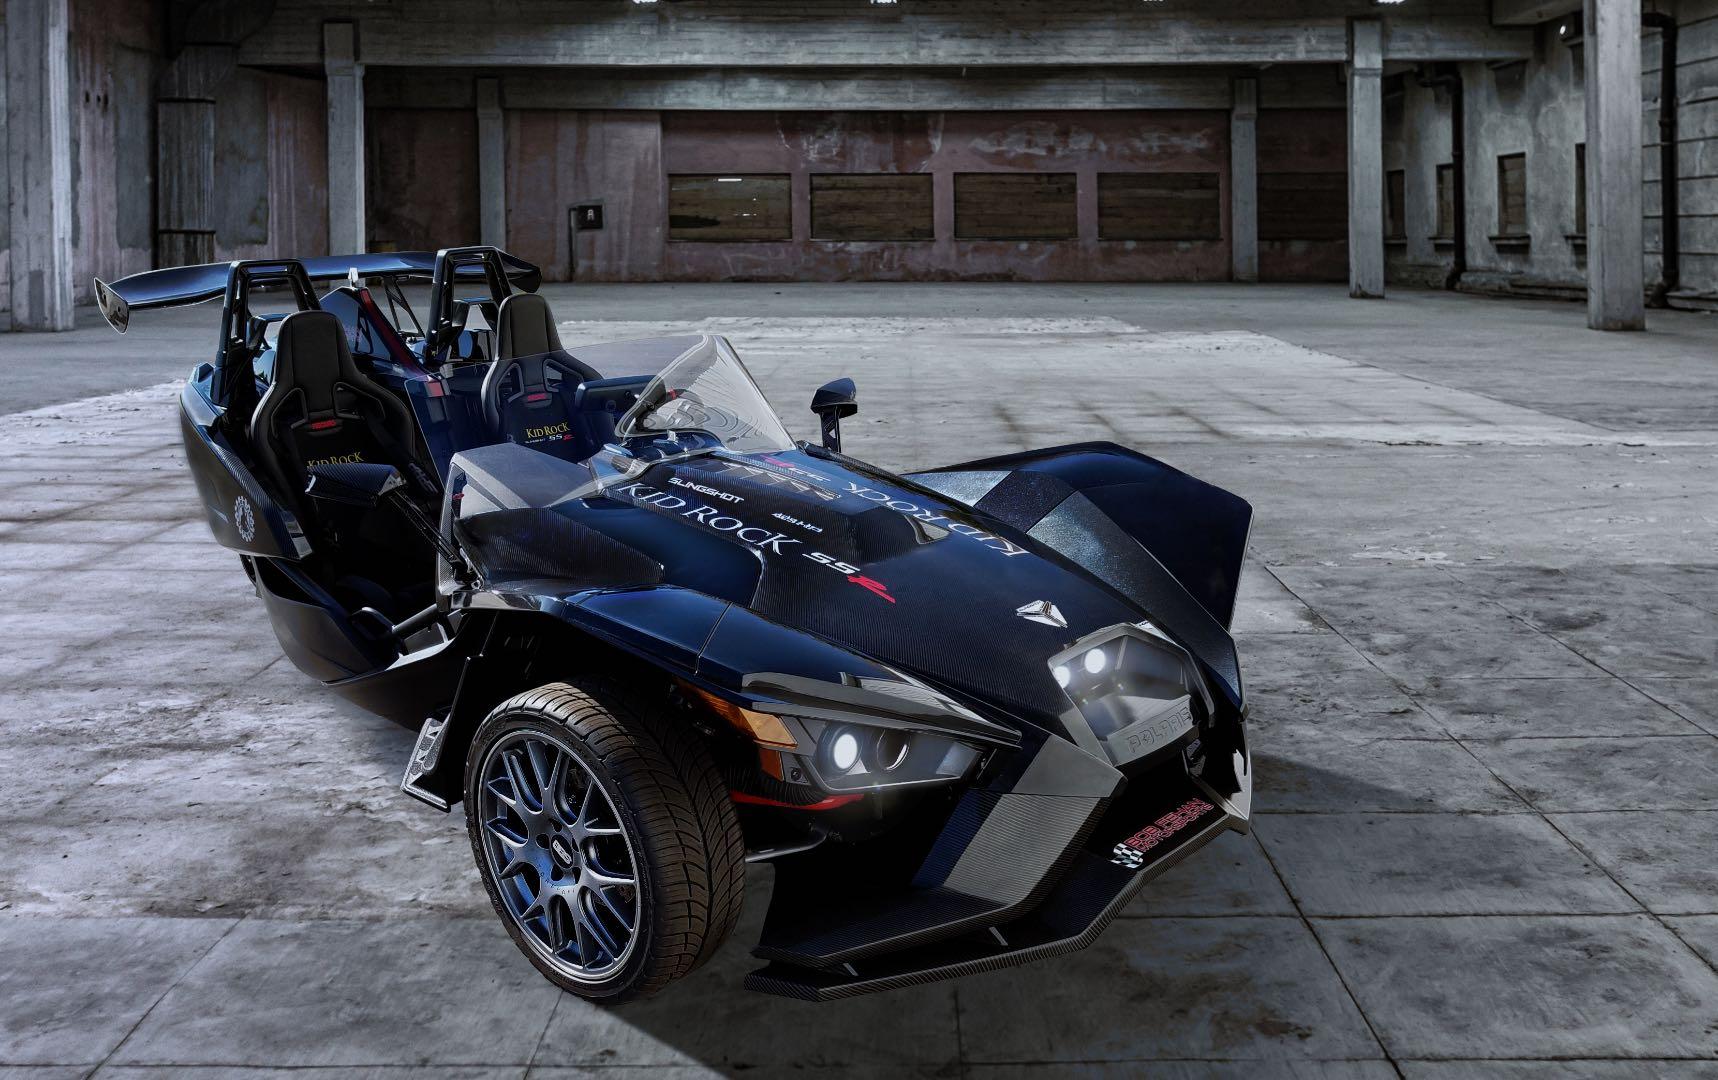 Turbocharged Kid Rock Concept Polaris Slingshot Rocks with 400 HP